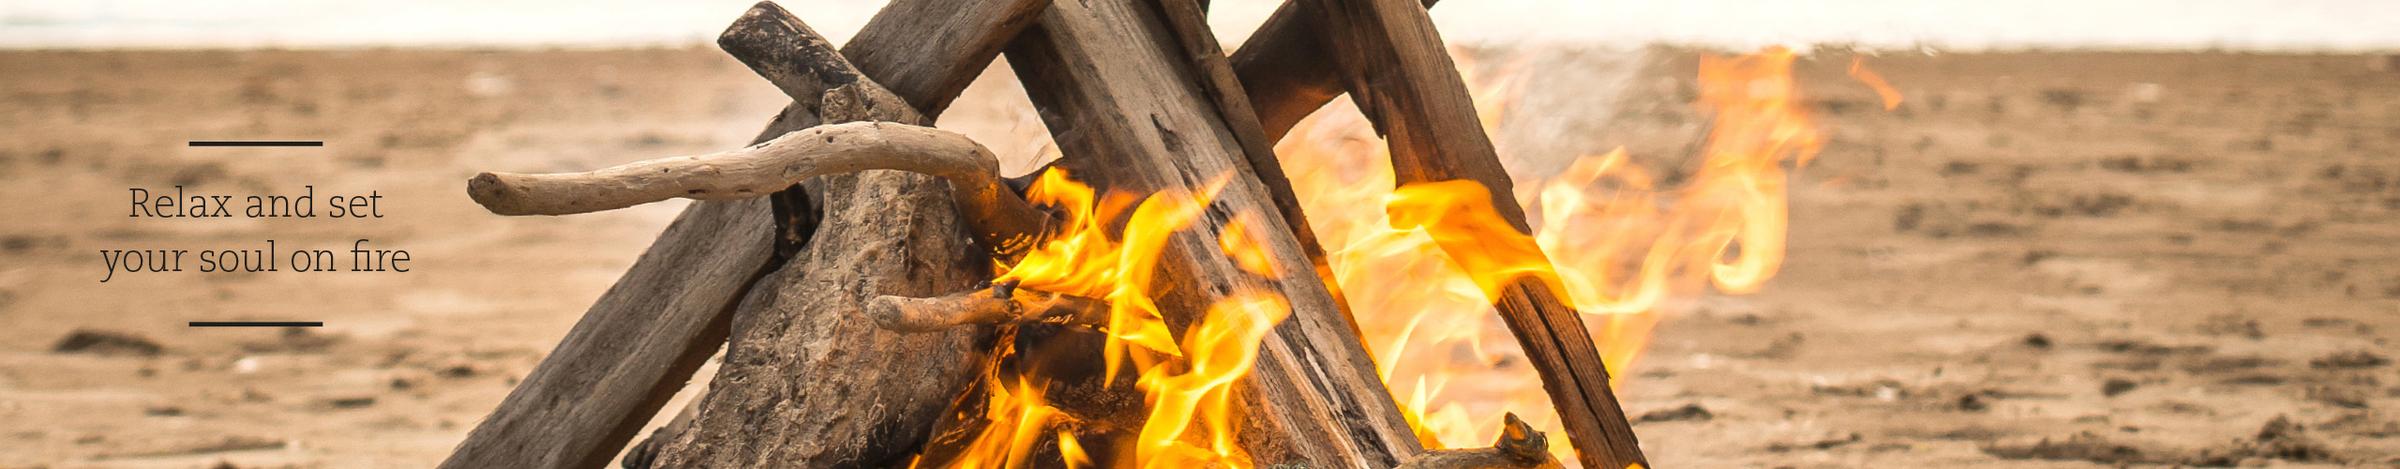 Wandtegels - Sfeerbanner-warmte